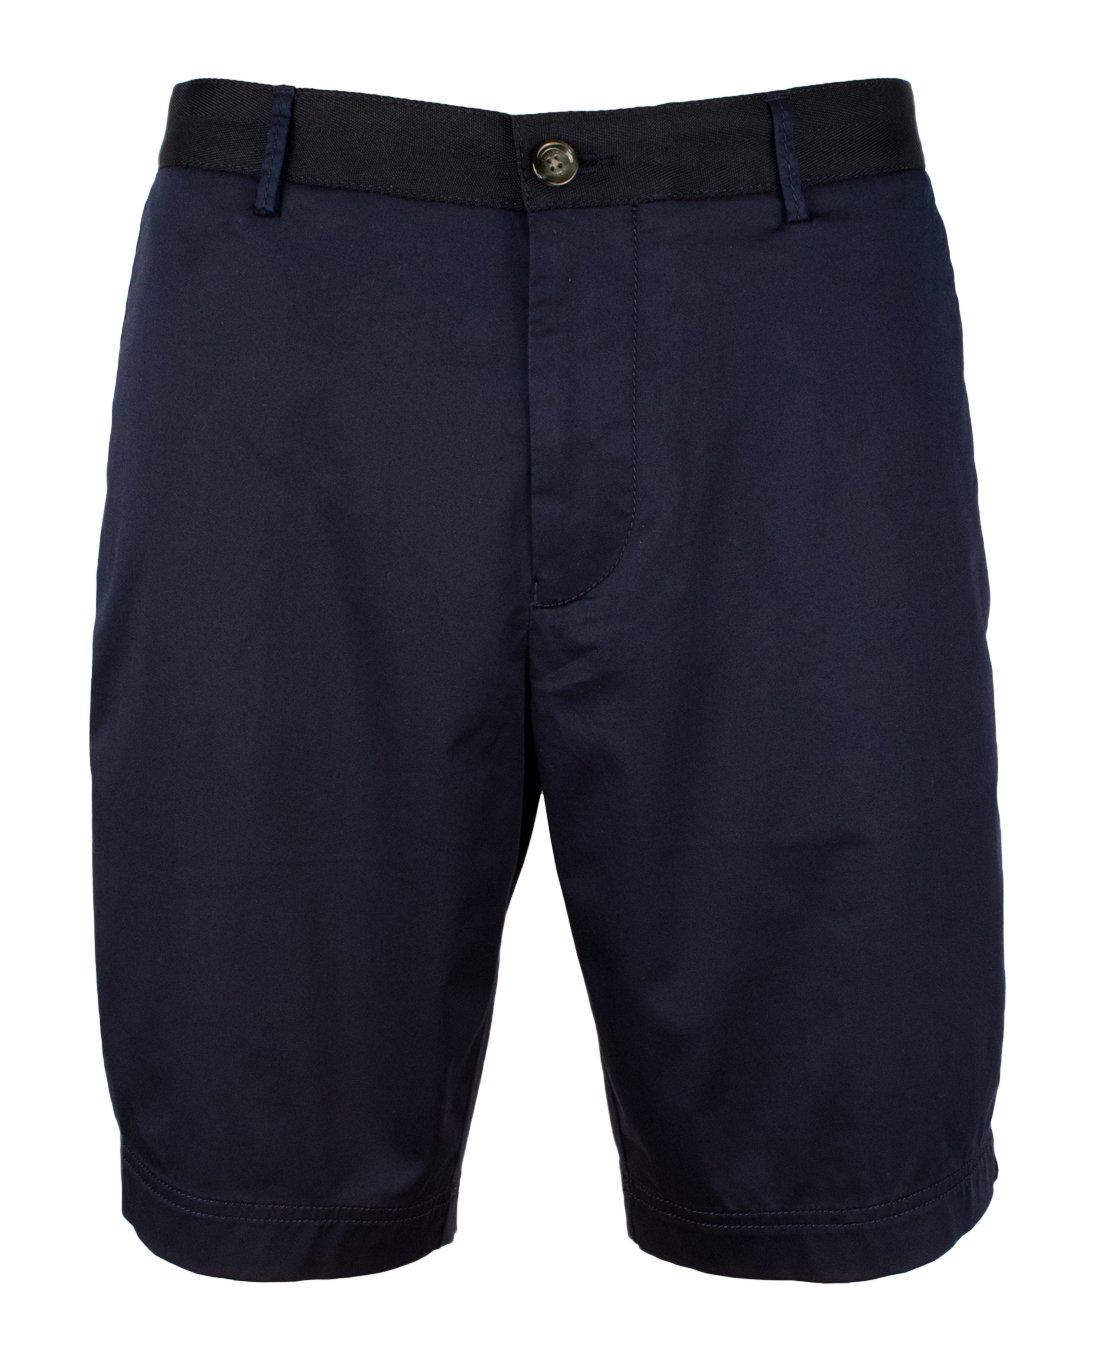 Hugo Boss Men's Regular Fit Crigan Stretch Shorts-DkBlu-34R